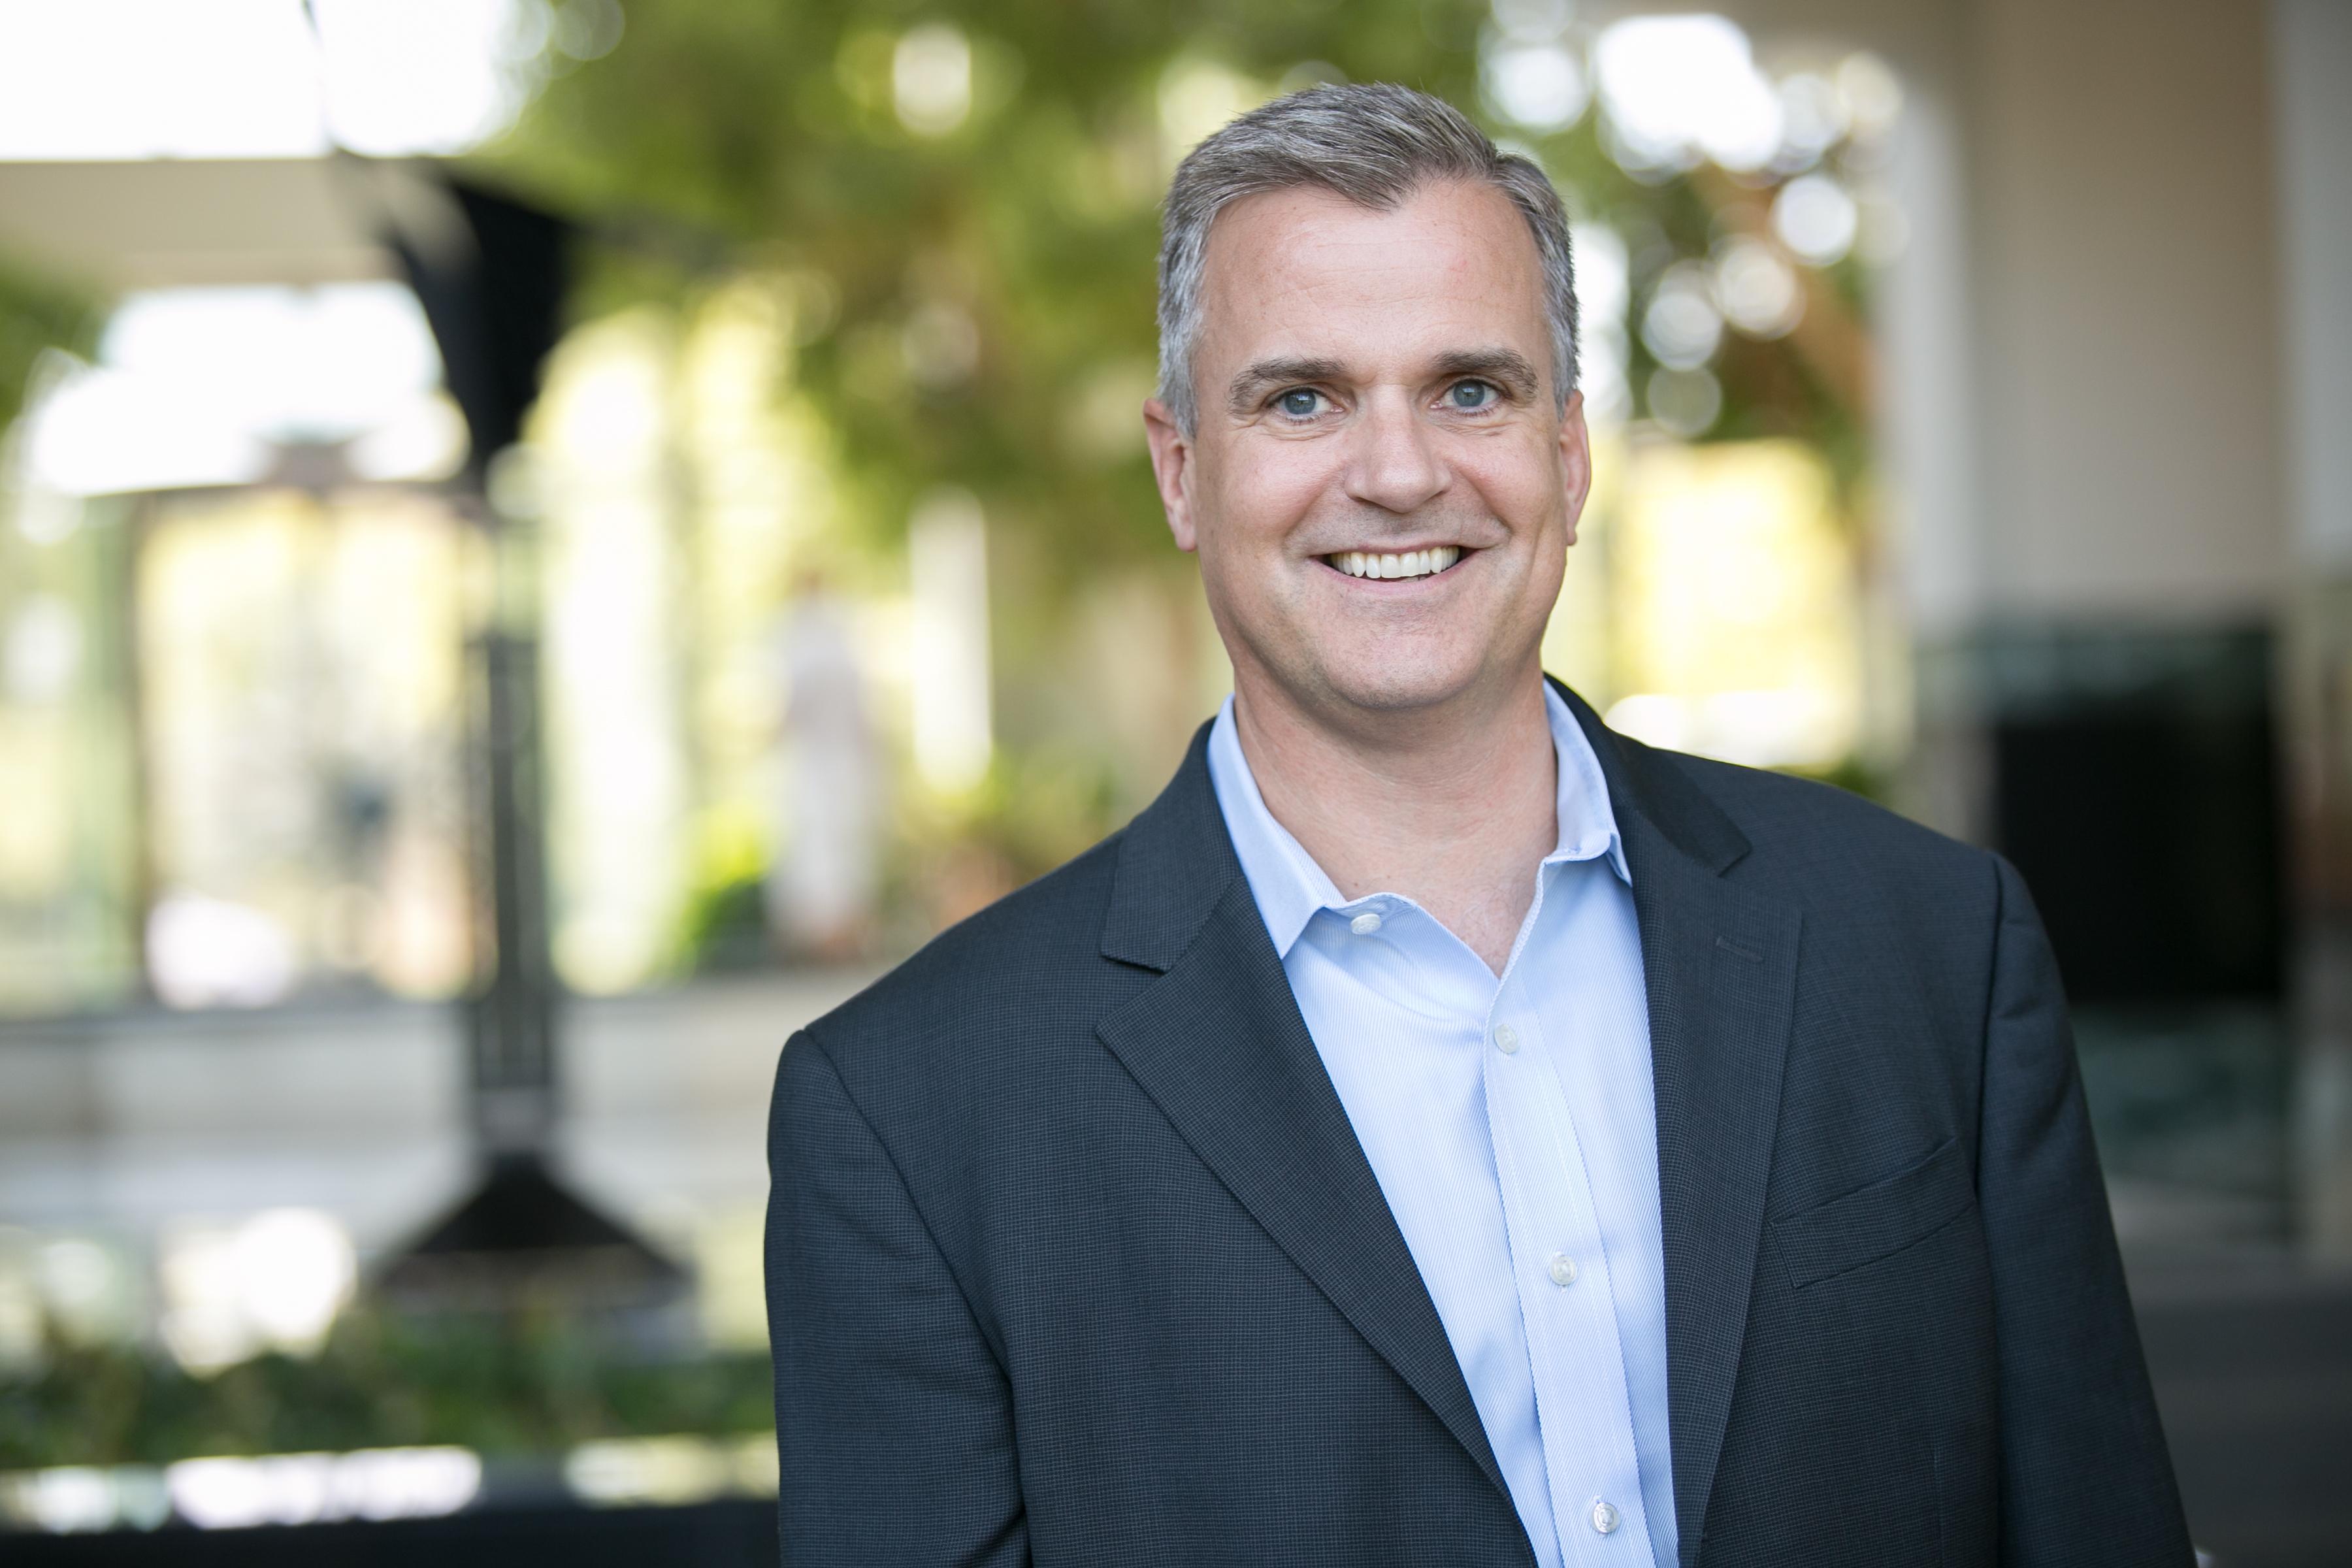 SkillSurvey CEO Ray Bixler